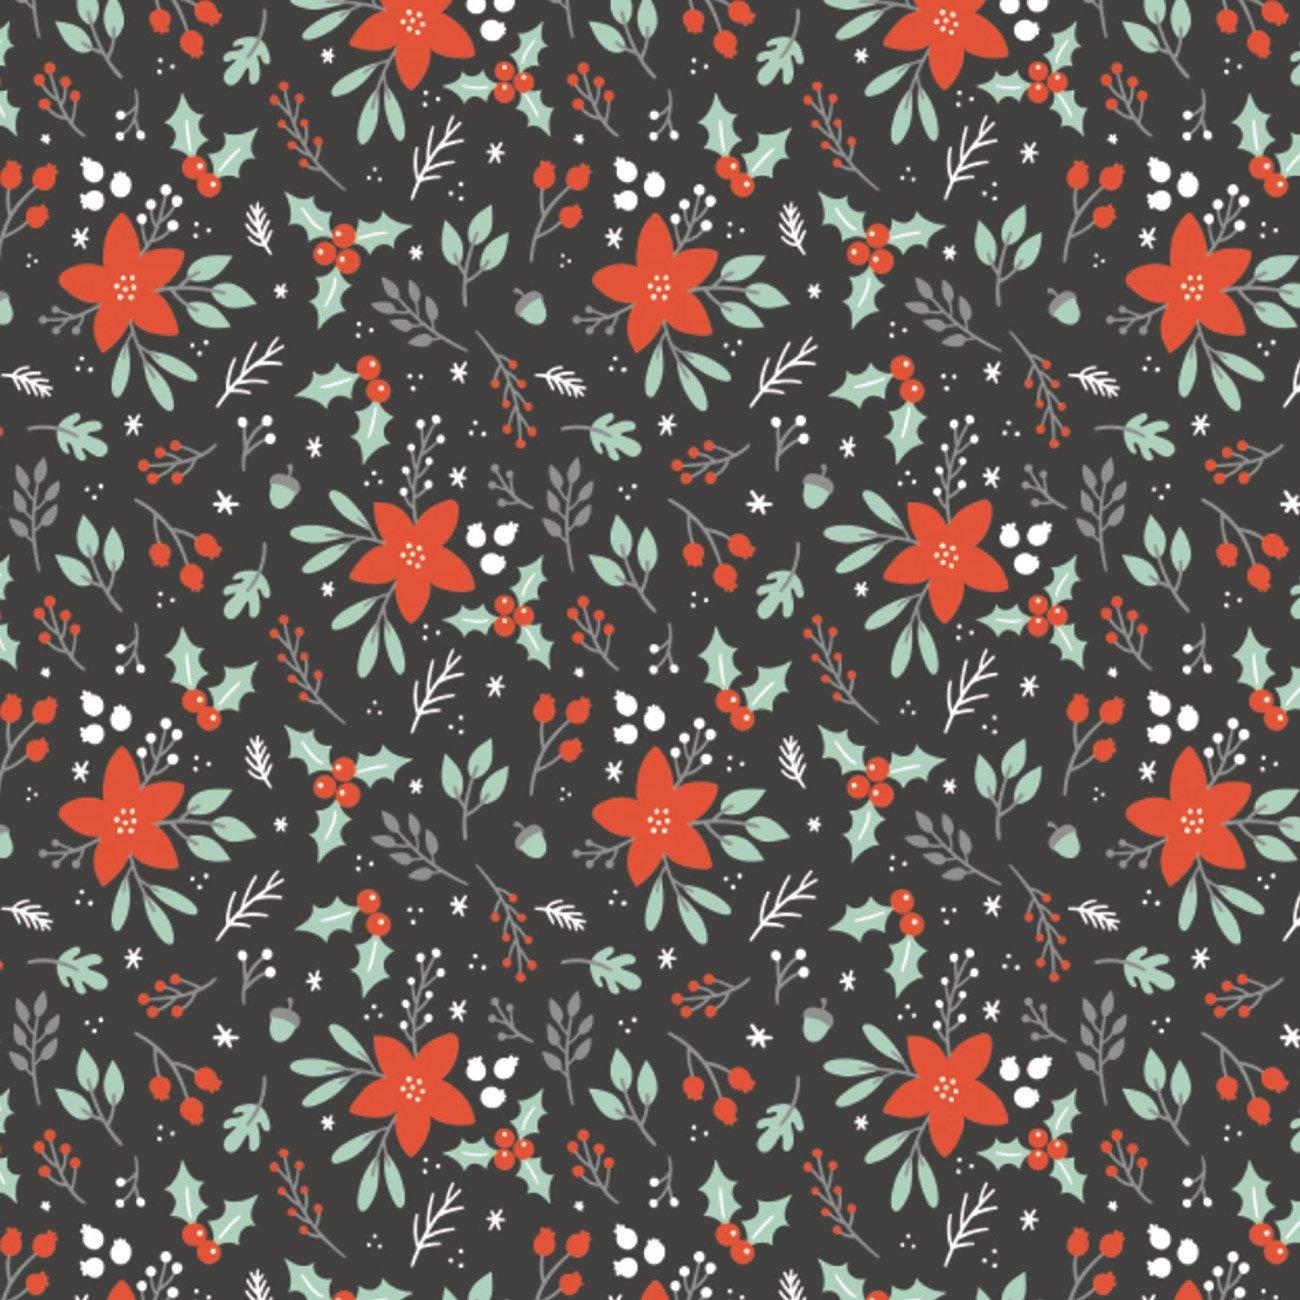 Reindeer Lodge 21191701_02 Charcoal